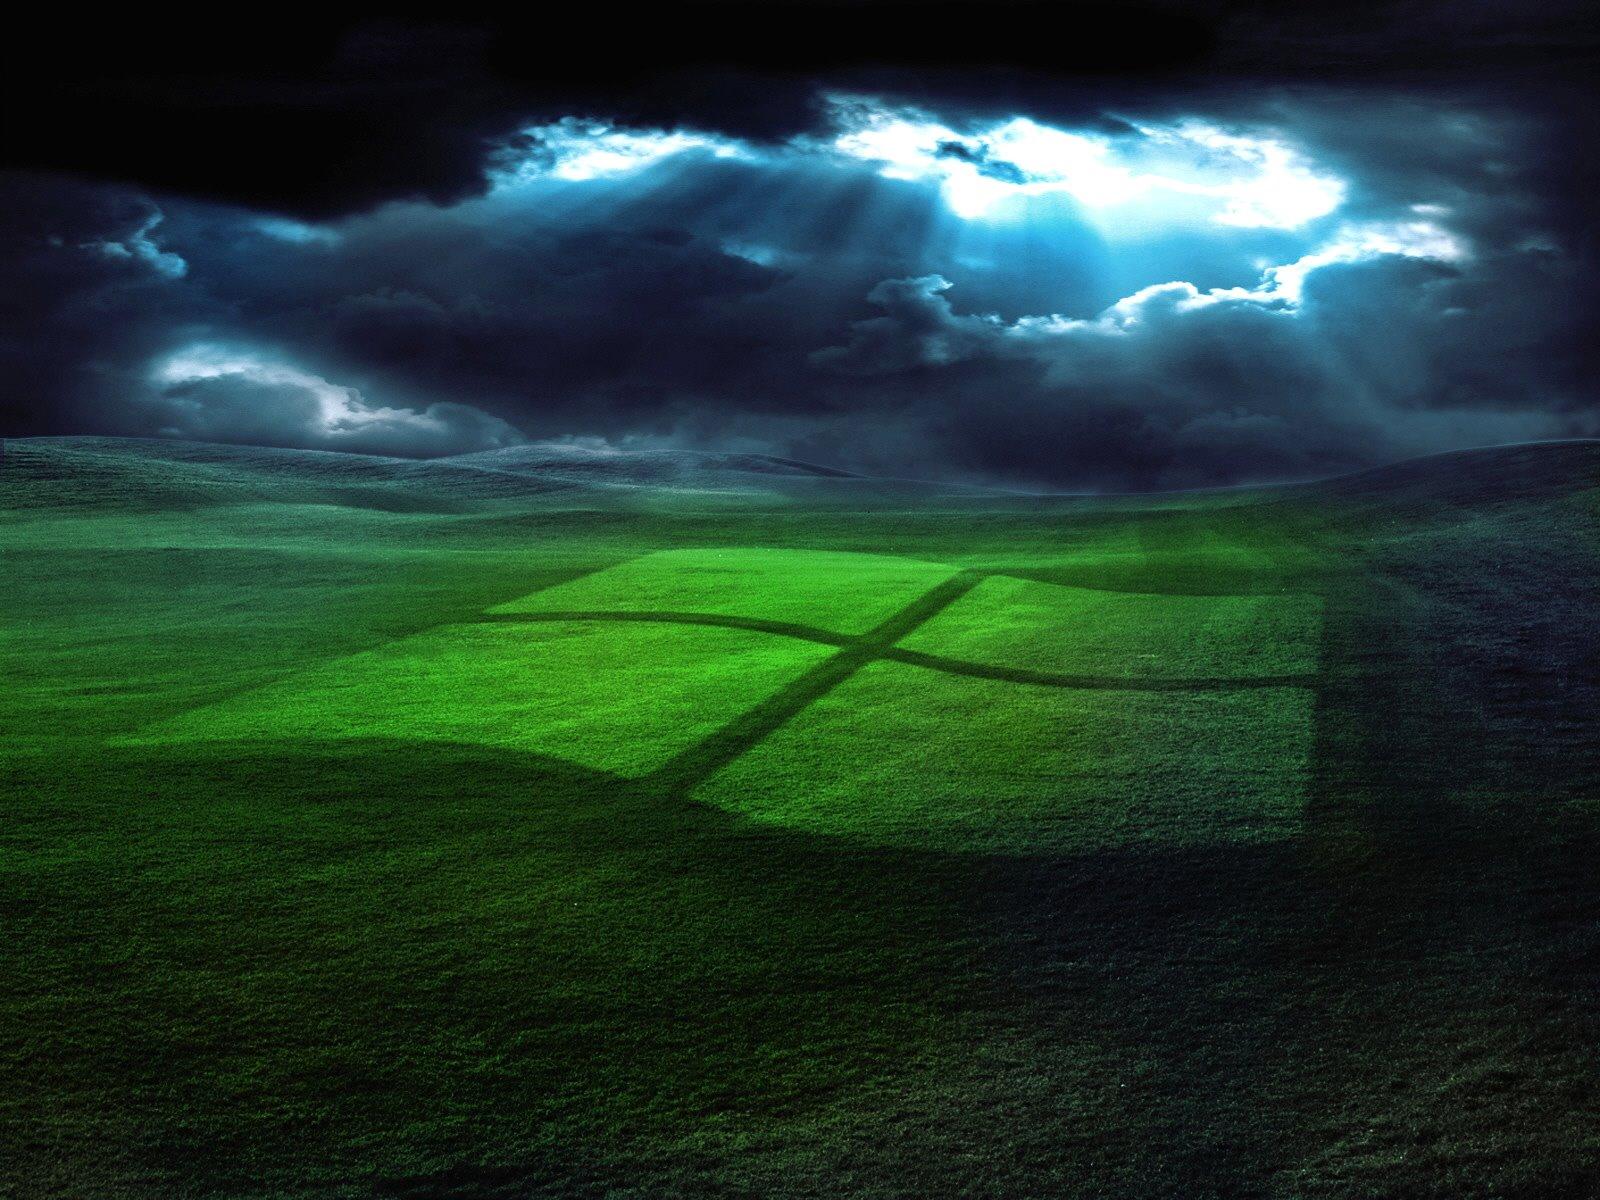 http://2.bp.blogspot.com/-atWQeaJZdDI/TbZtblsfLZI/AAAAAAAAA34/IgZ9CXfCOIg/s1600/In_storm_windows_XP.jpg